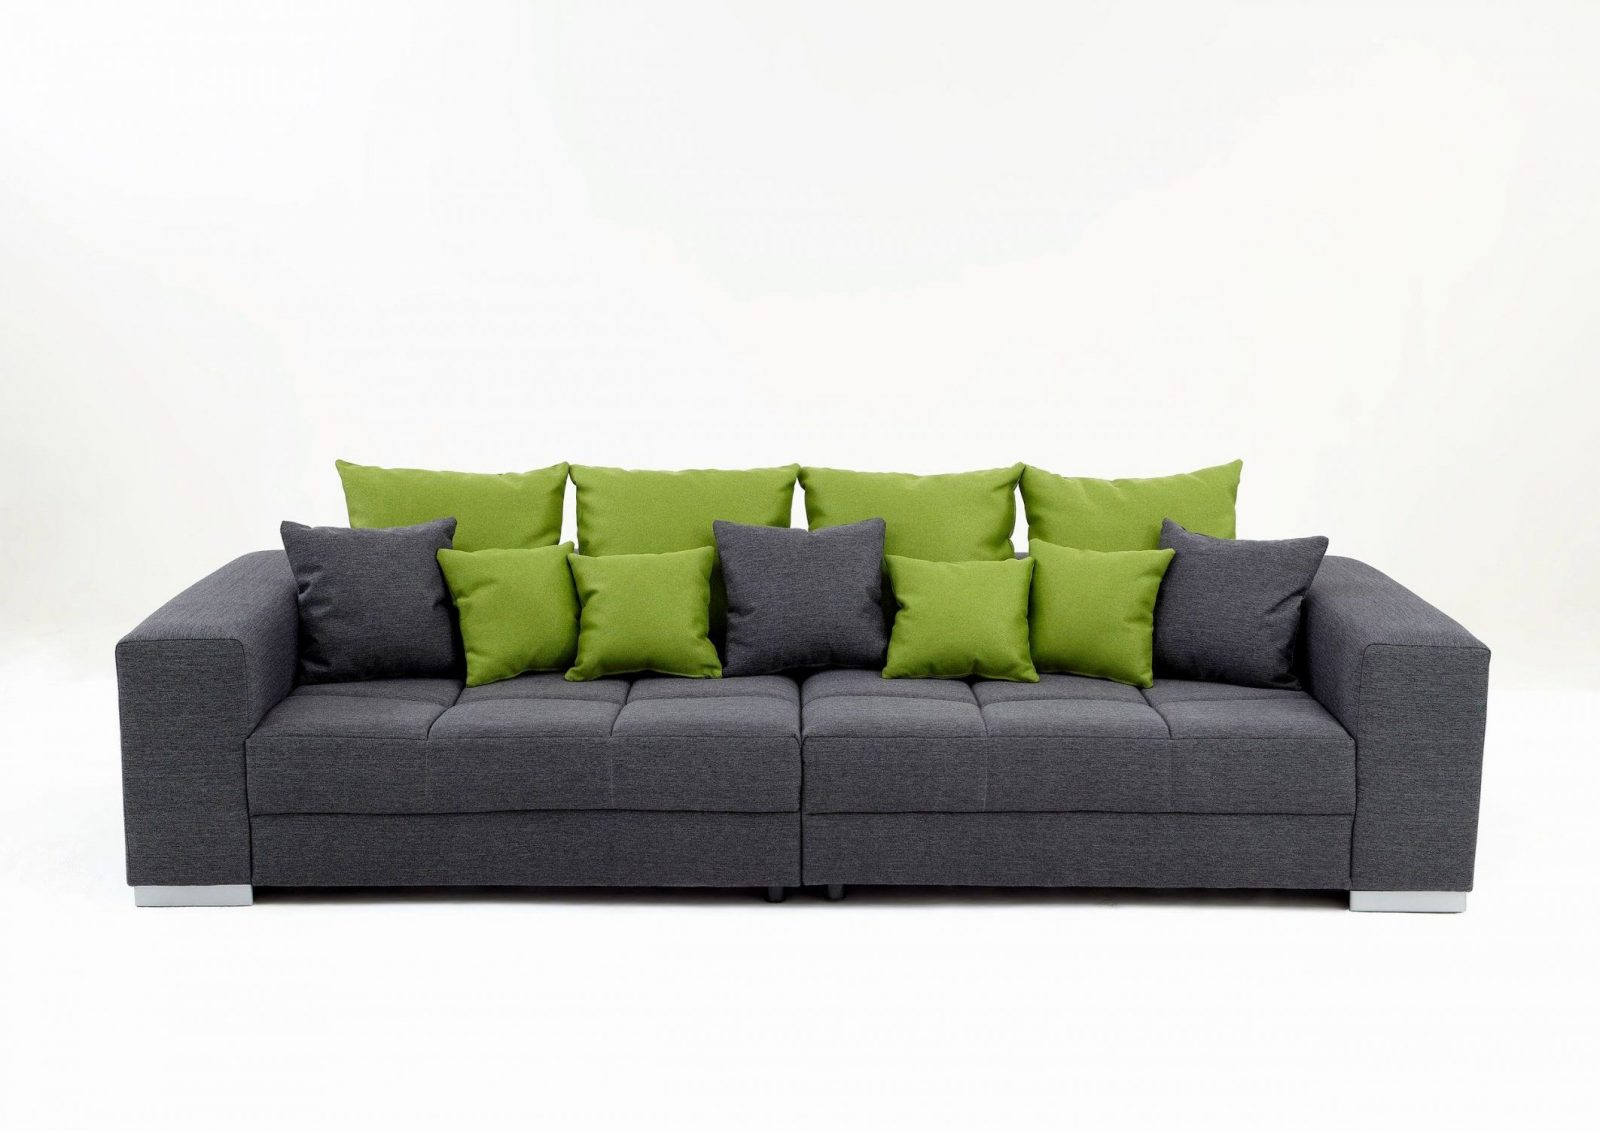 Big Sofa Möbel Boss  Bürostuhl von Möbel Boss Big Sofa Bild